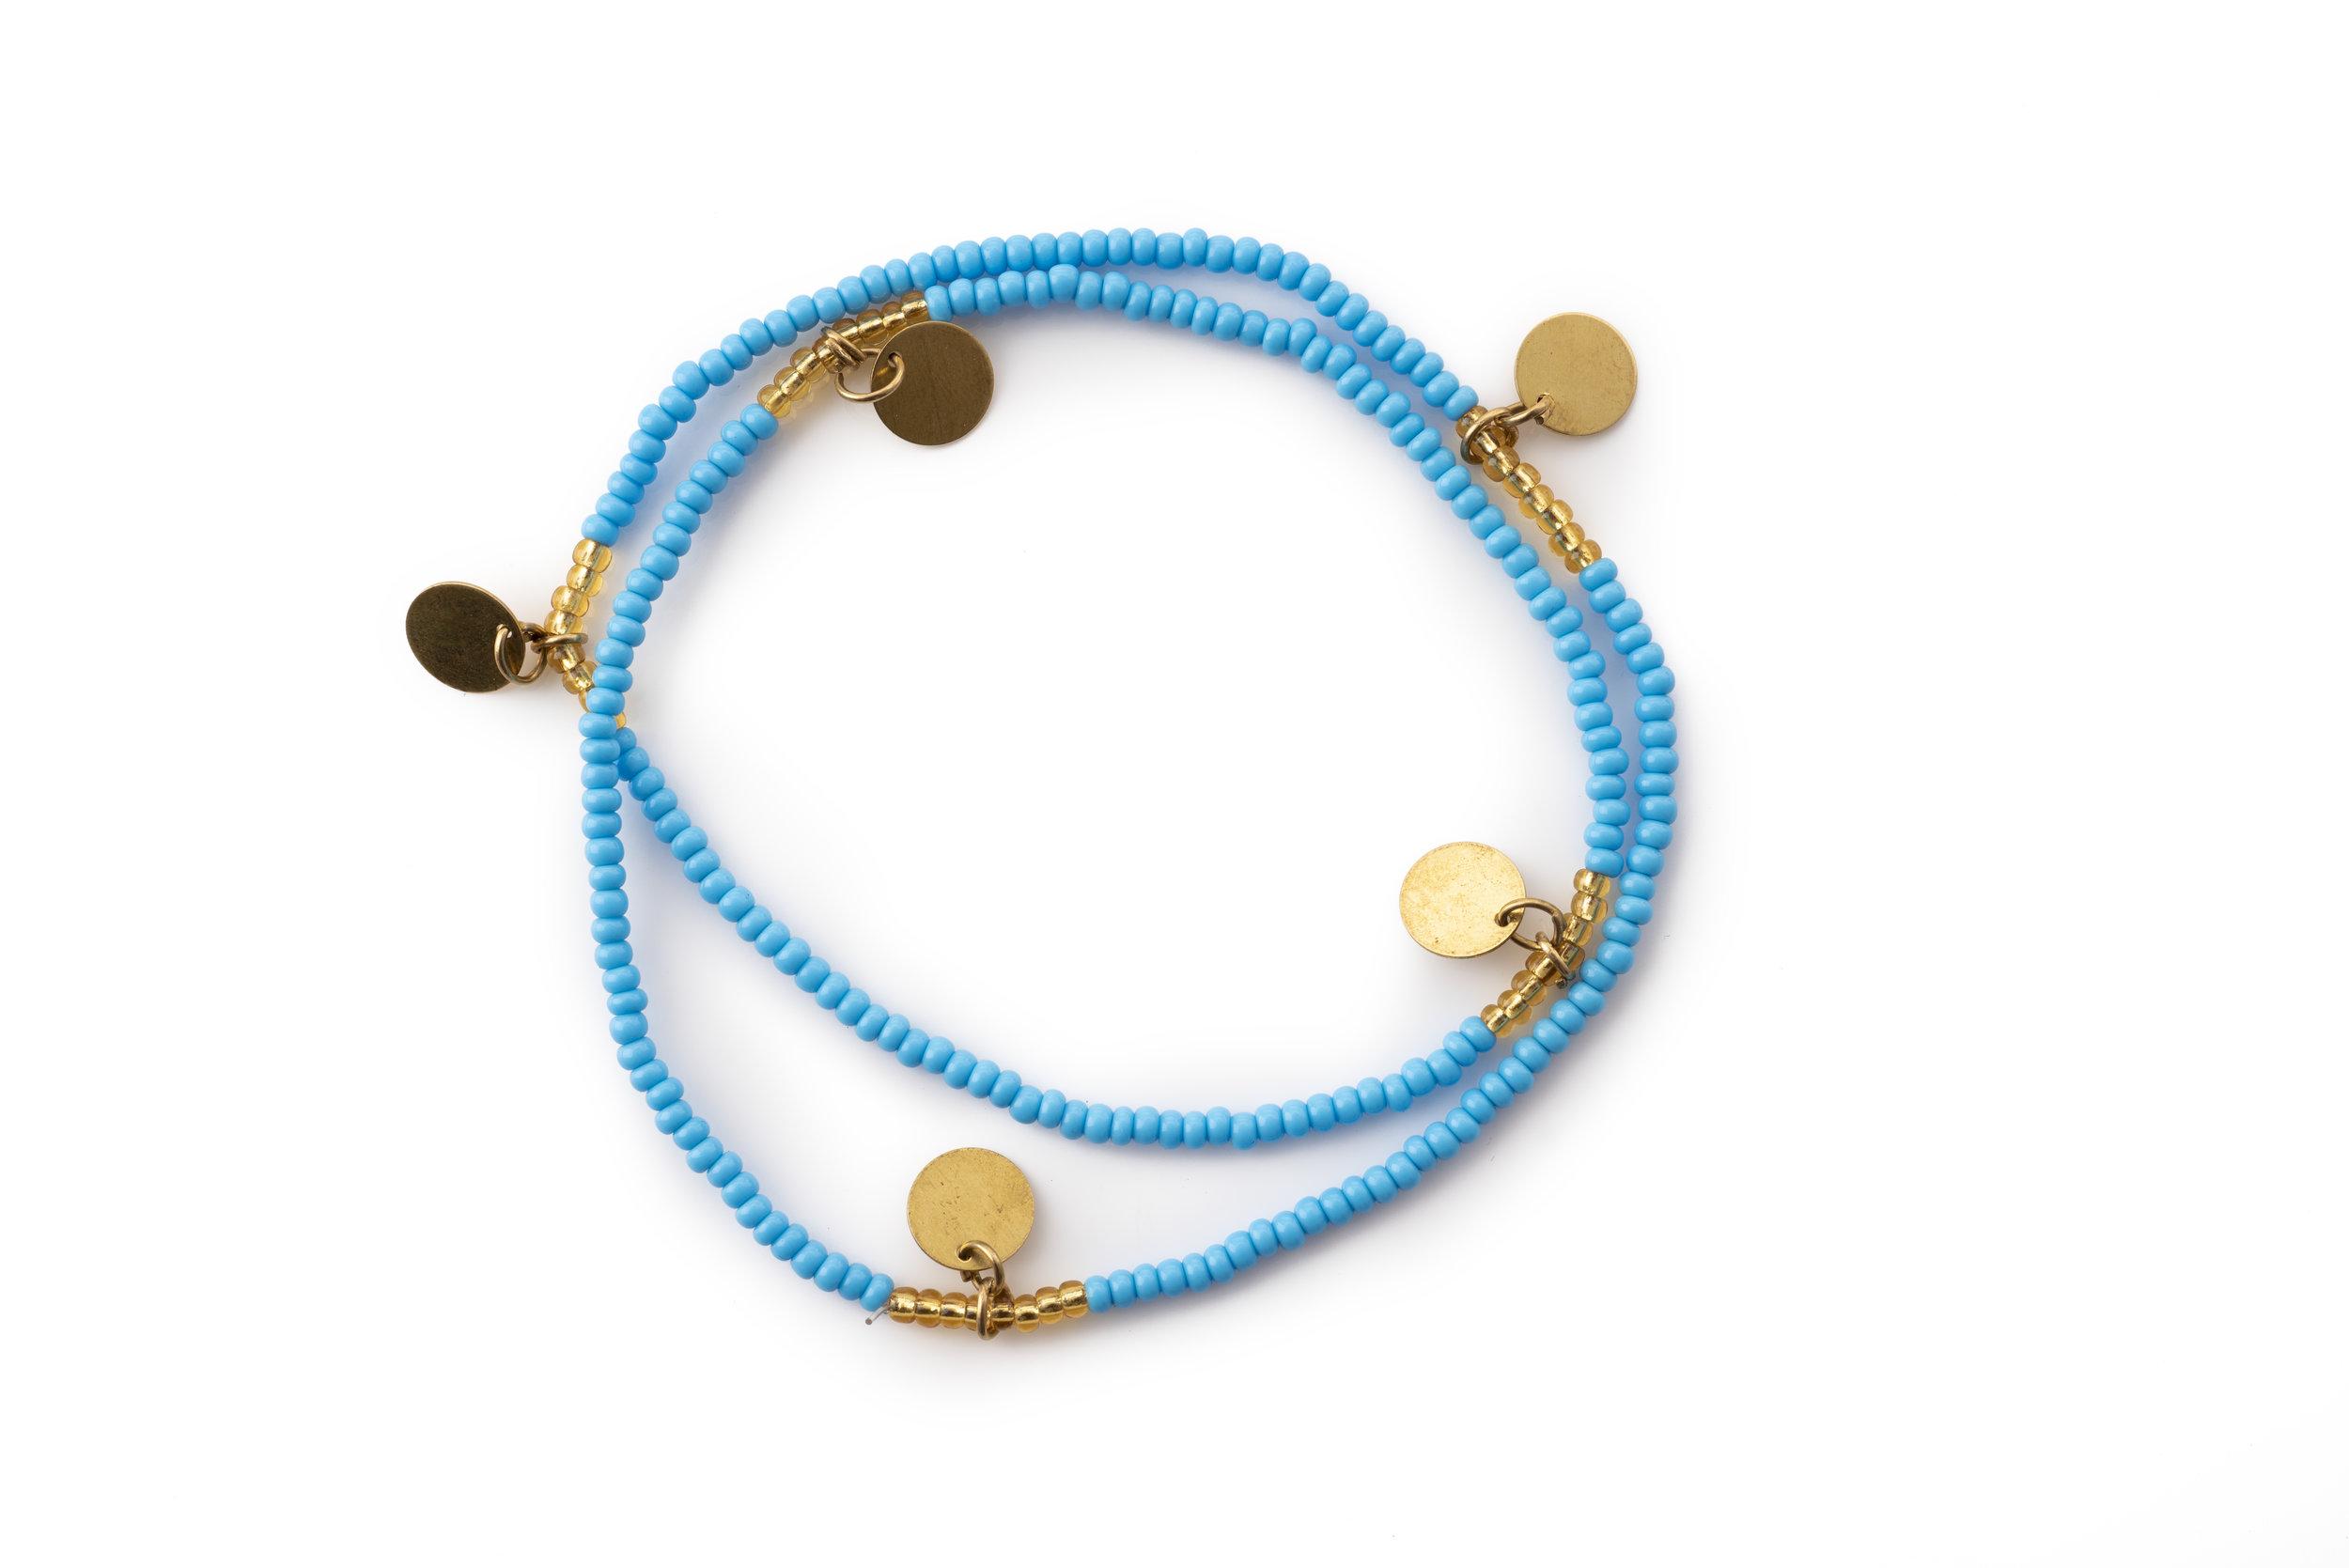 Giriama disc bracelet/anklet